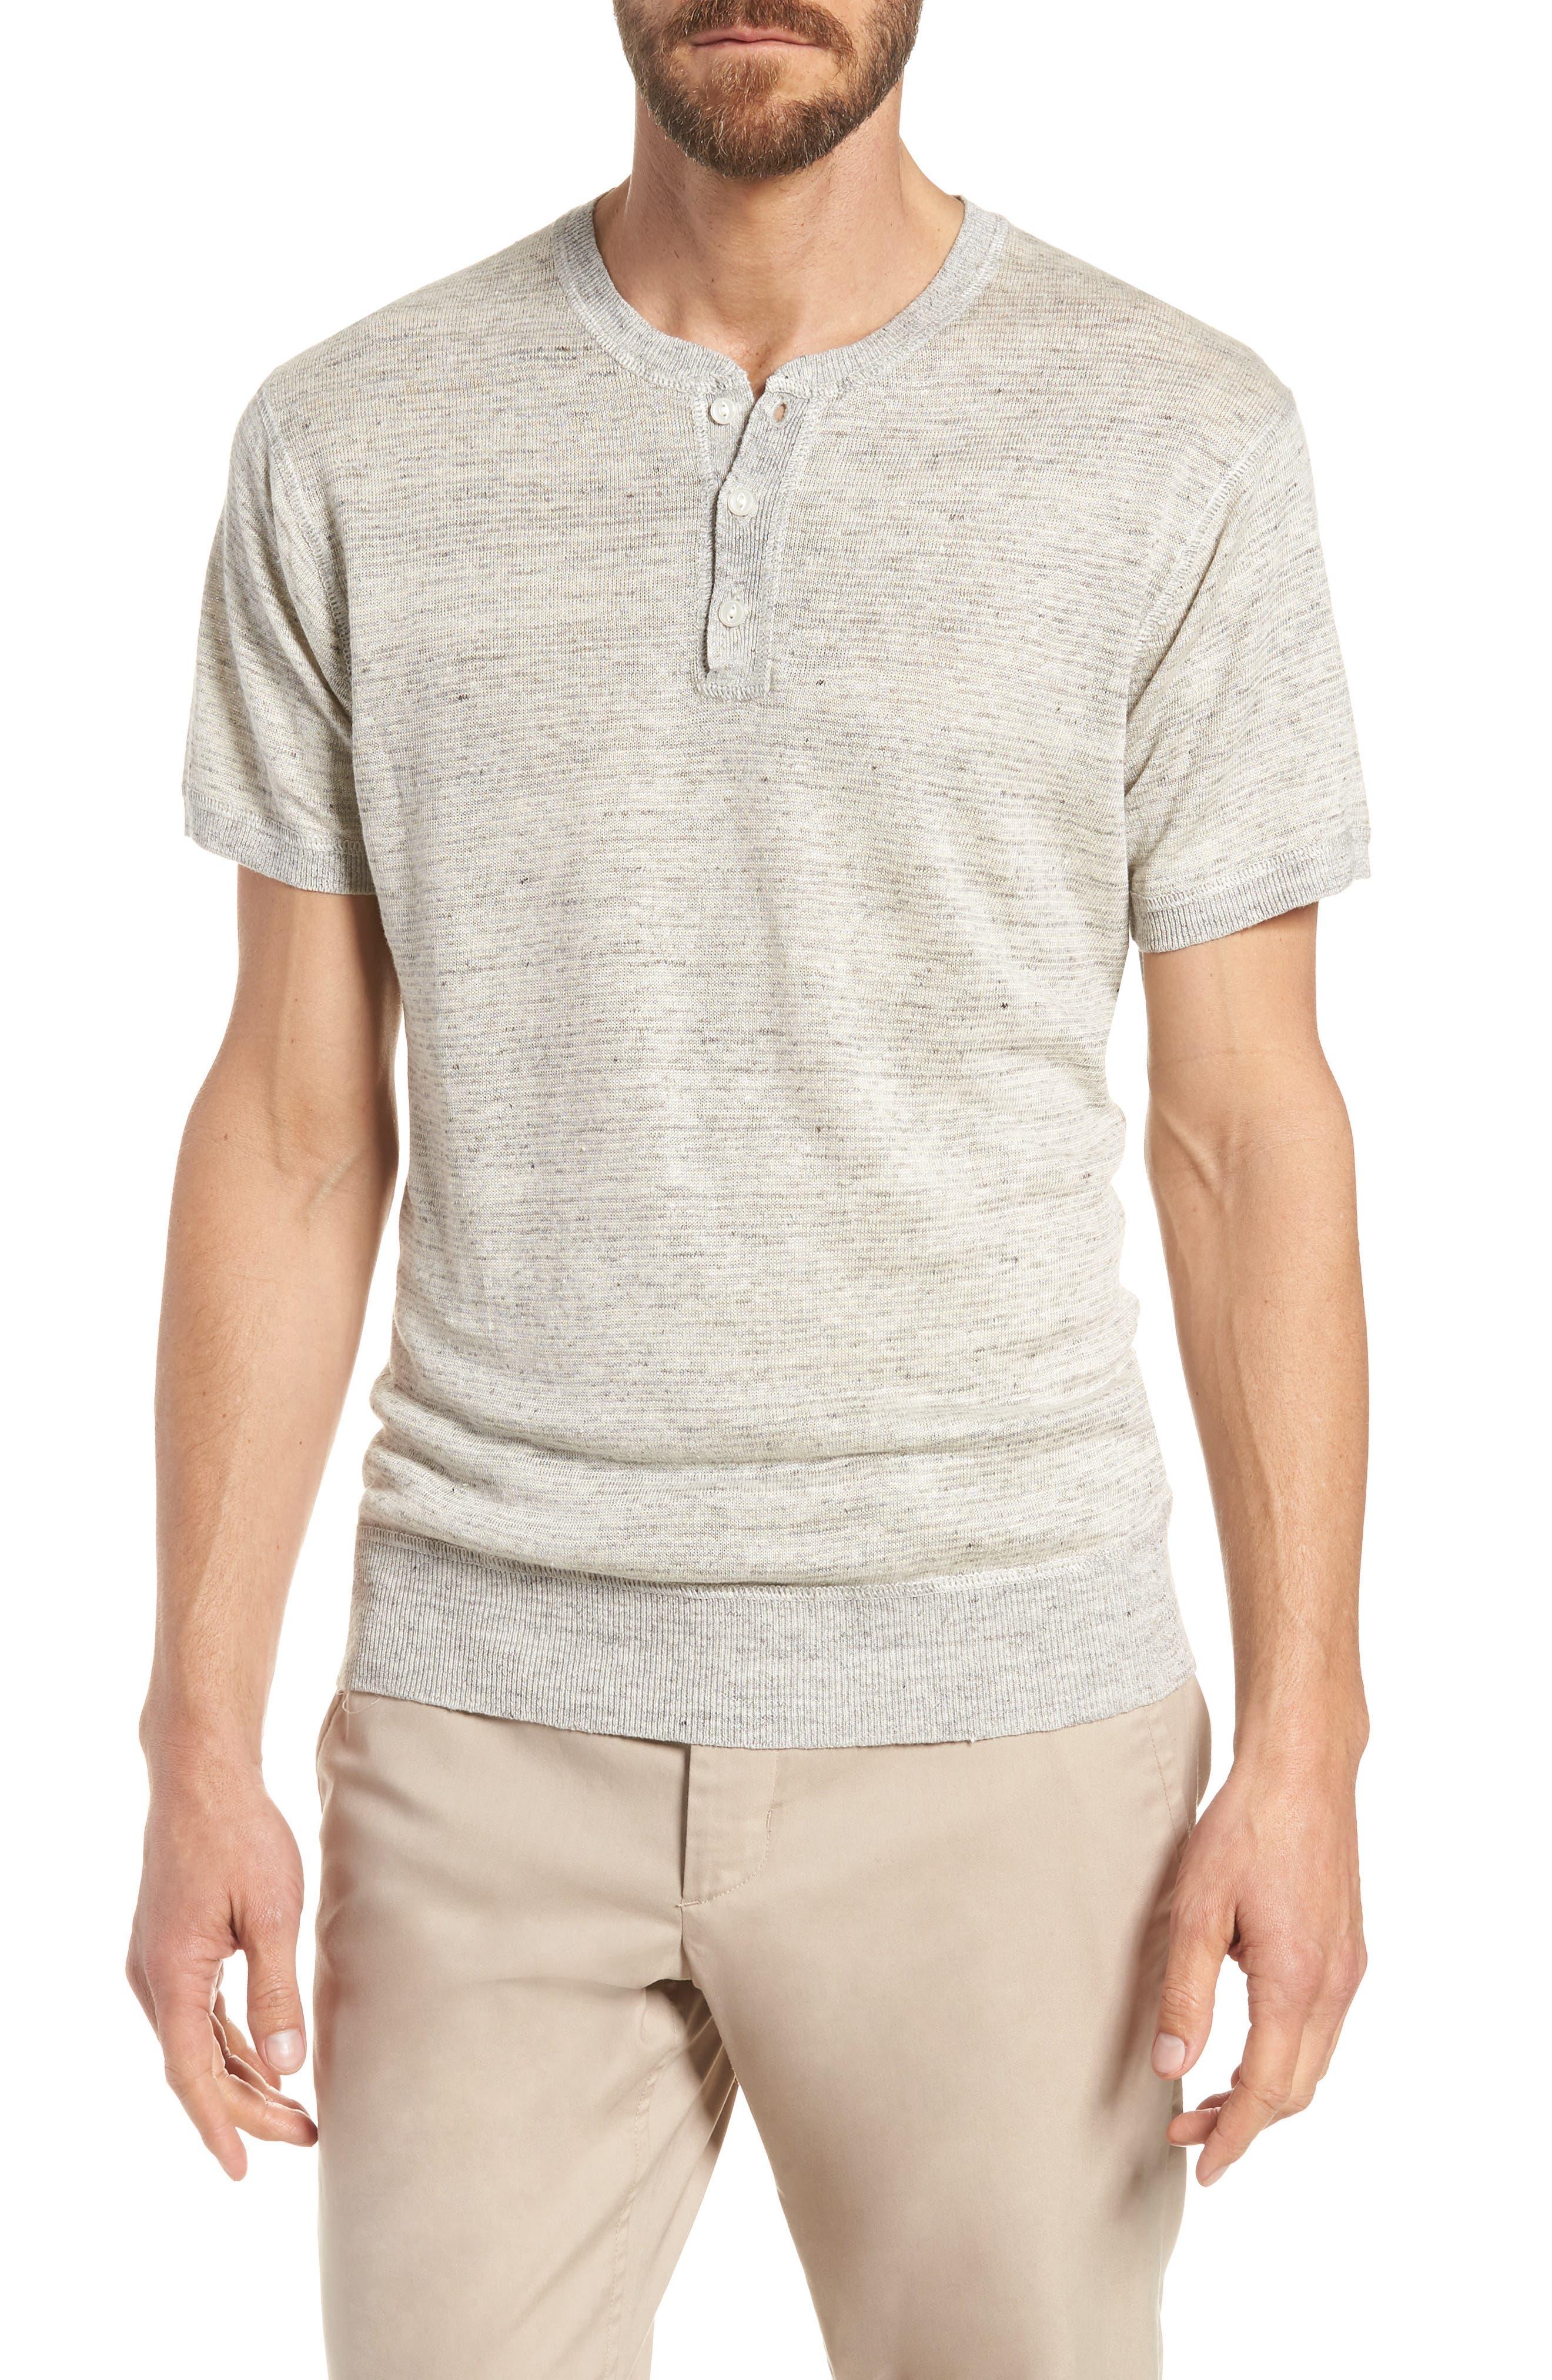 BONOBOS Linen Henley T-Shirt, Main, color, 022